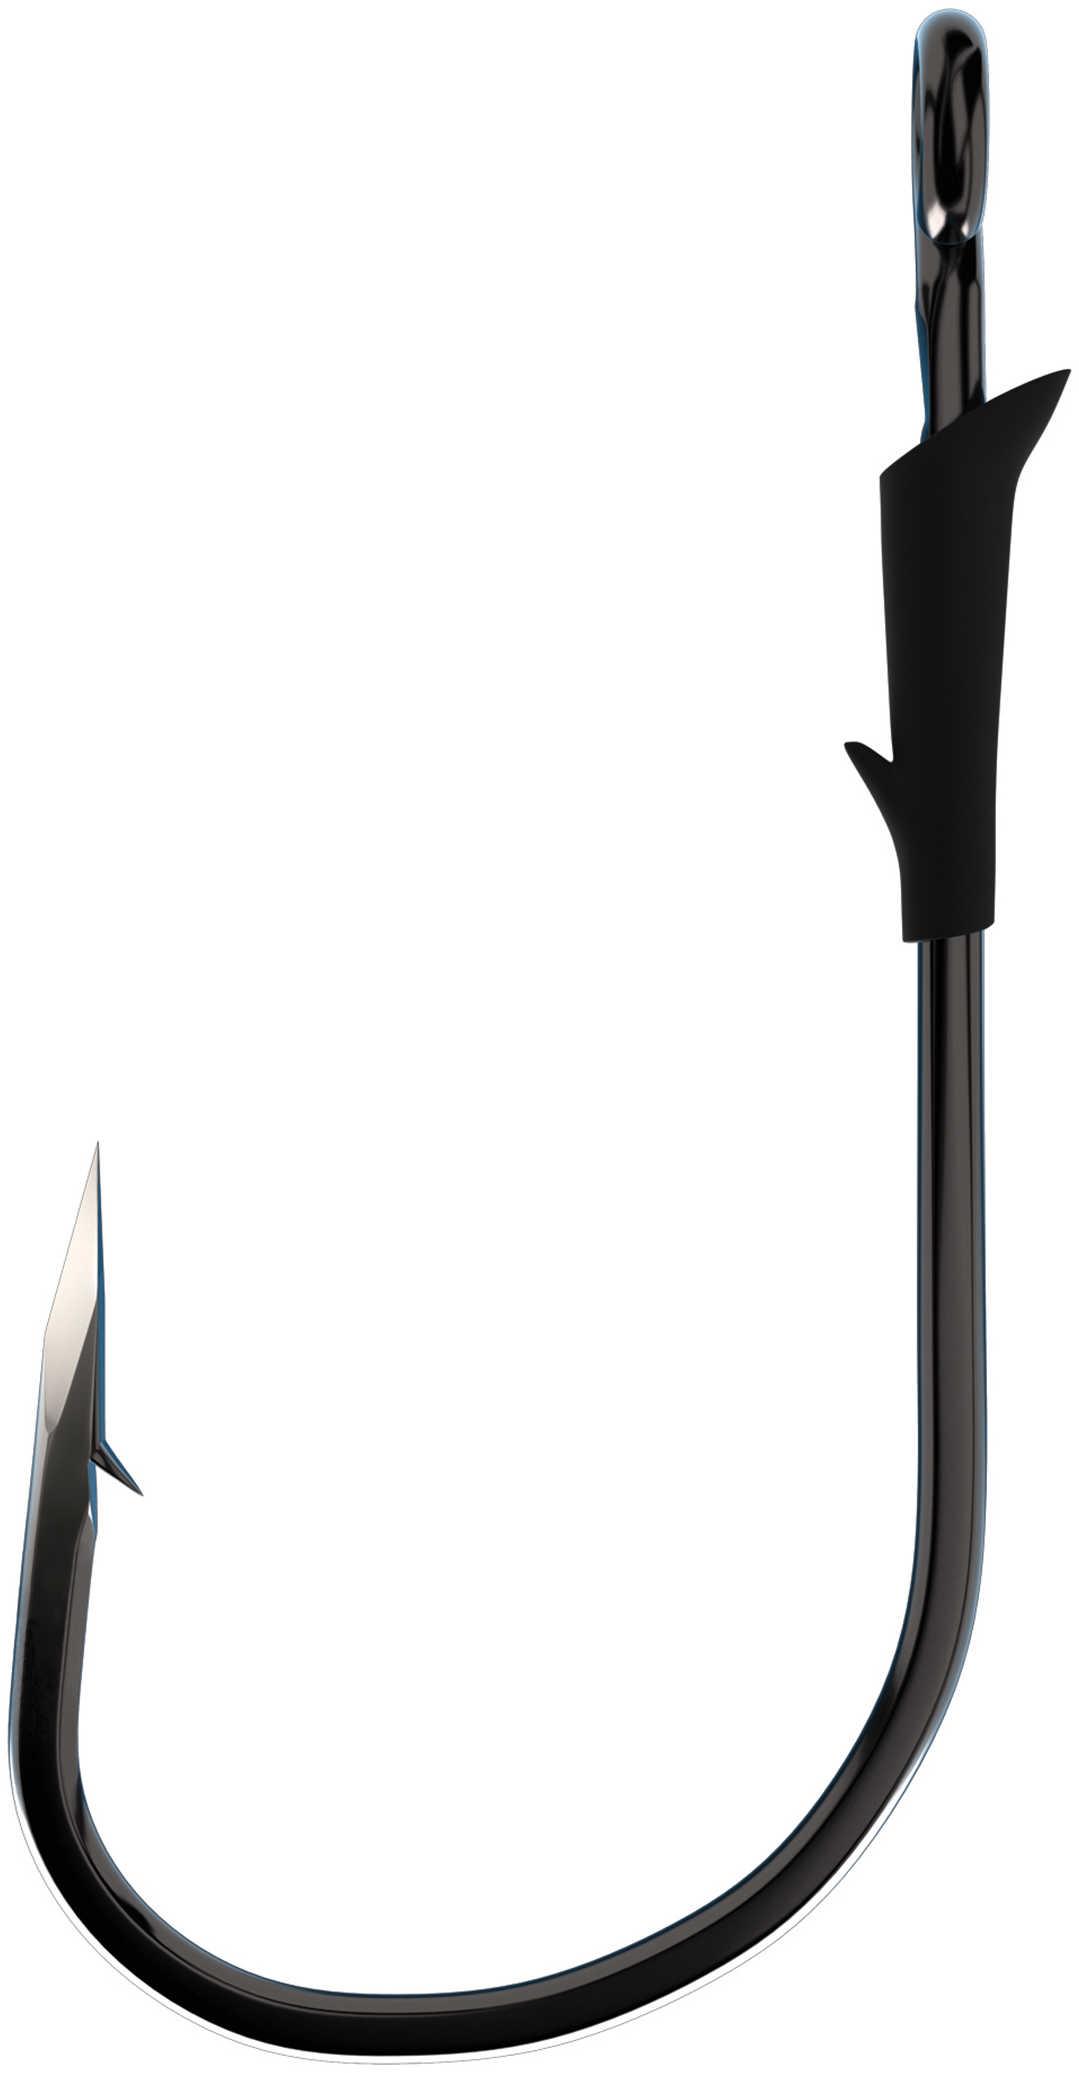 Eagle Claw Fishing Tackle Trokar Flippin Hook Platinum Black 4Pk 6/0 Md#: K130-6/0